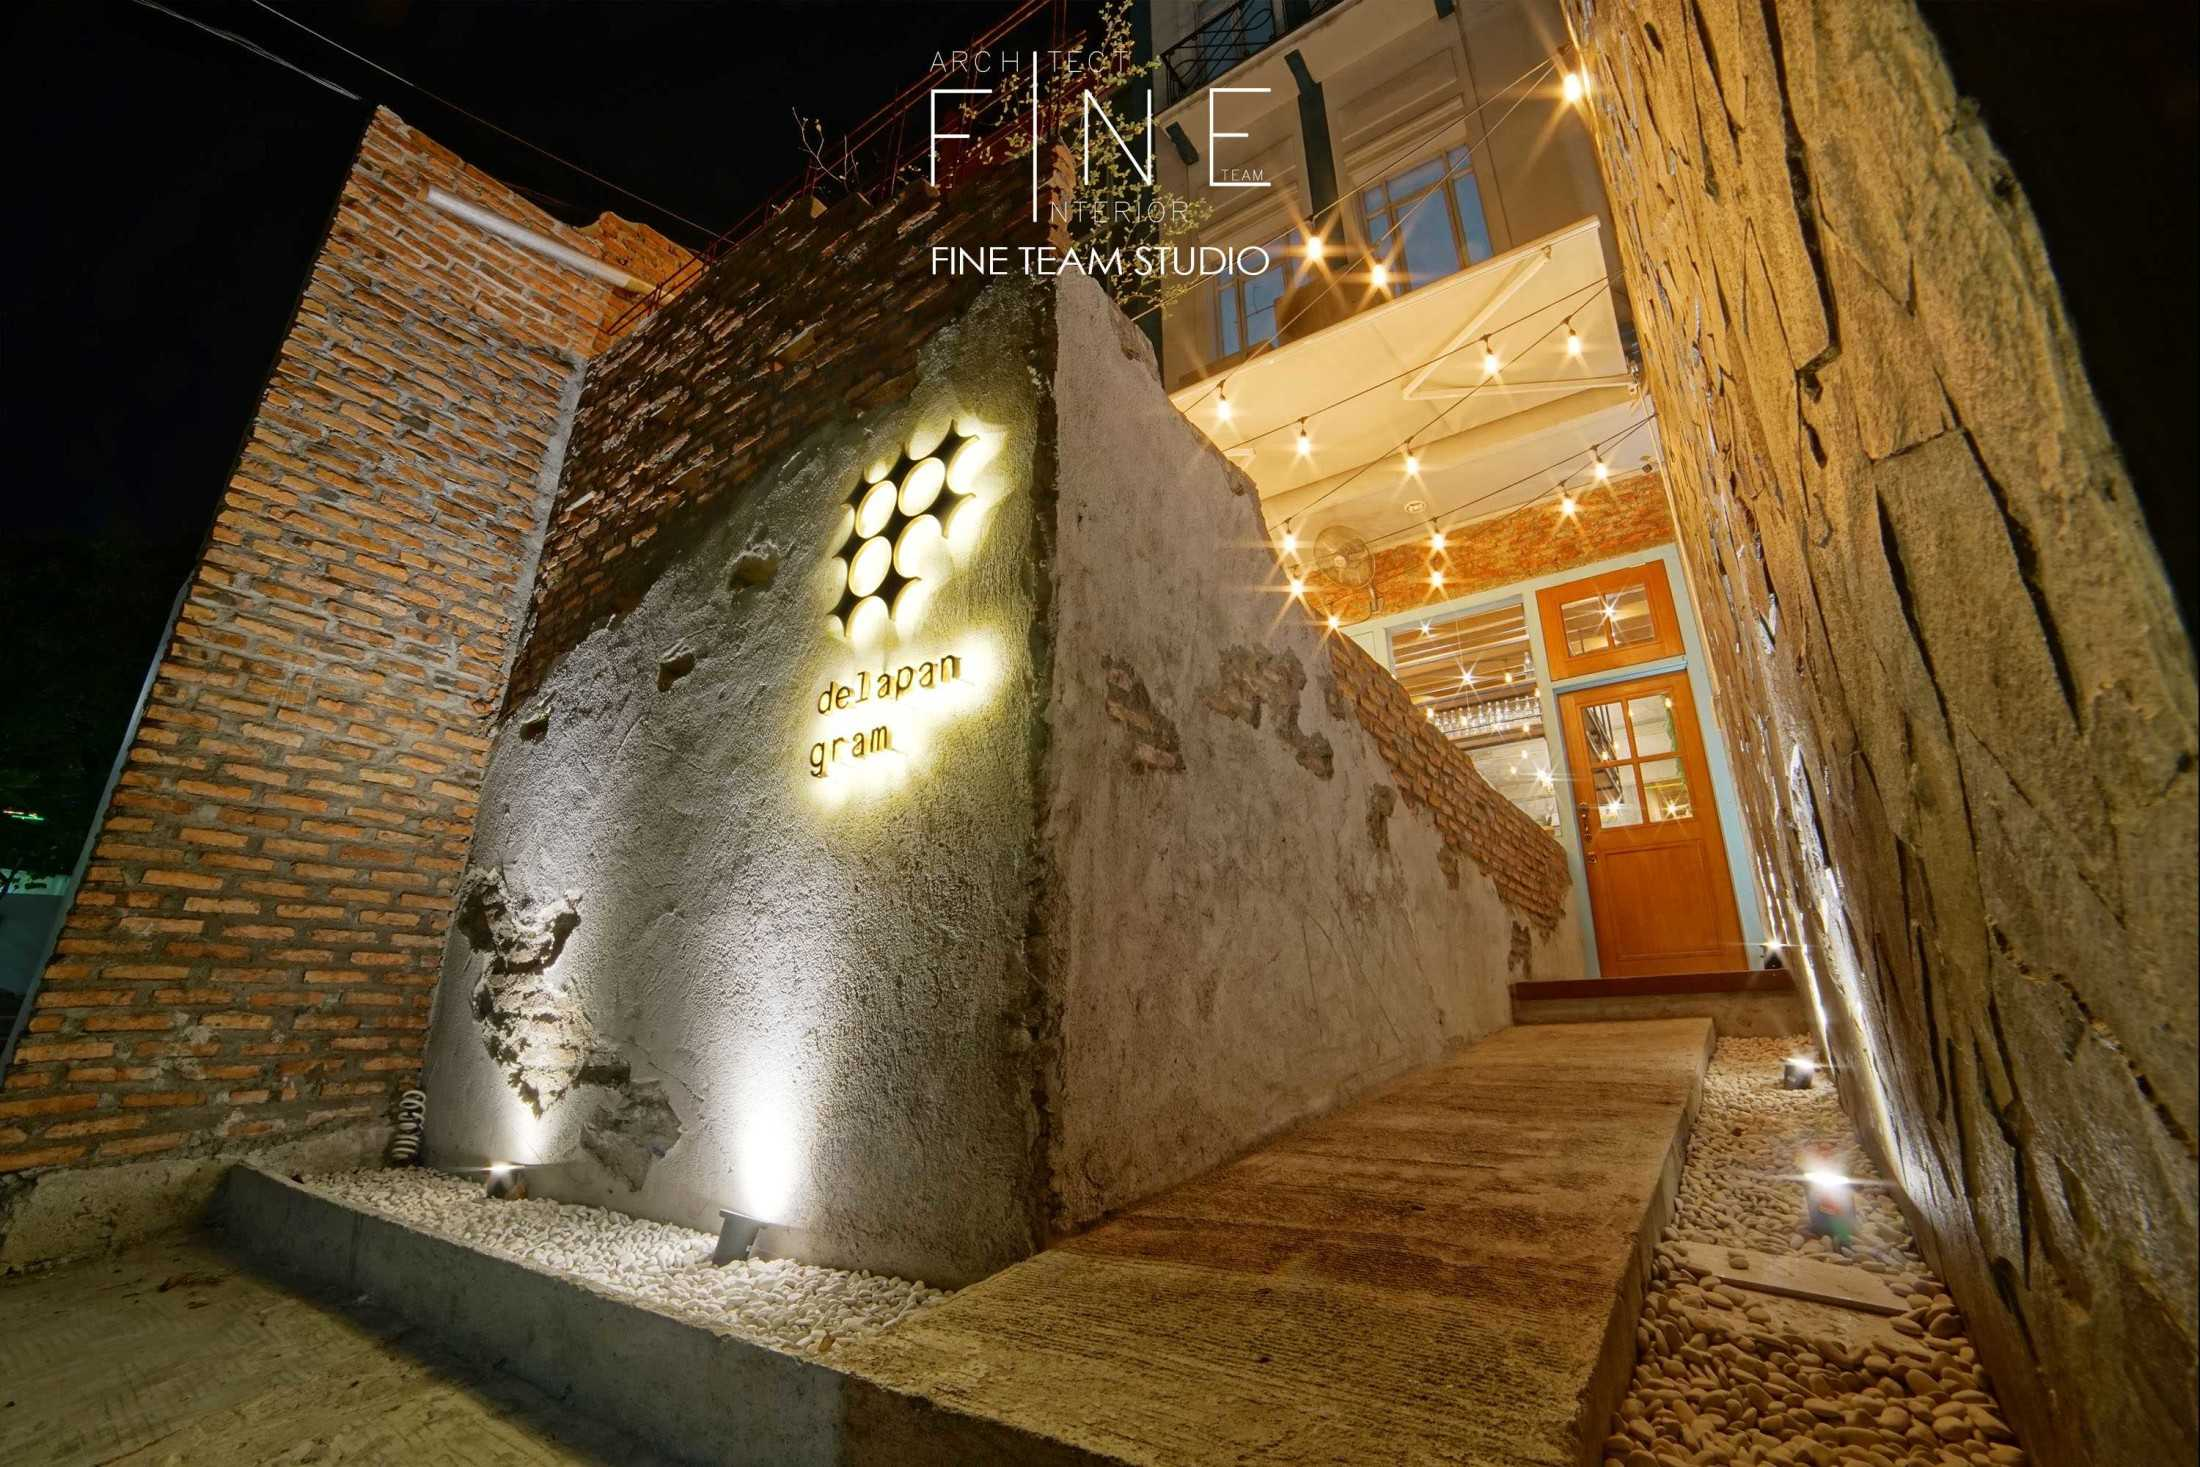 Foto inspirasi ide desain restoran kontemporer Fine-team-studio-delapan-gram oleh Fine Team Studio di Arsitag